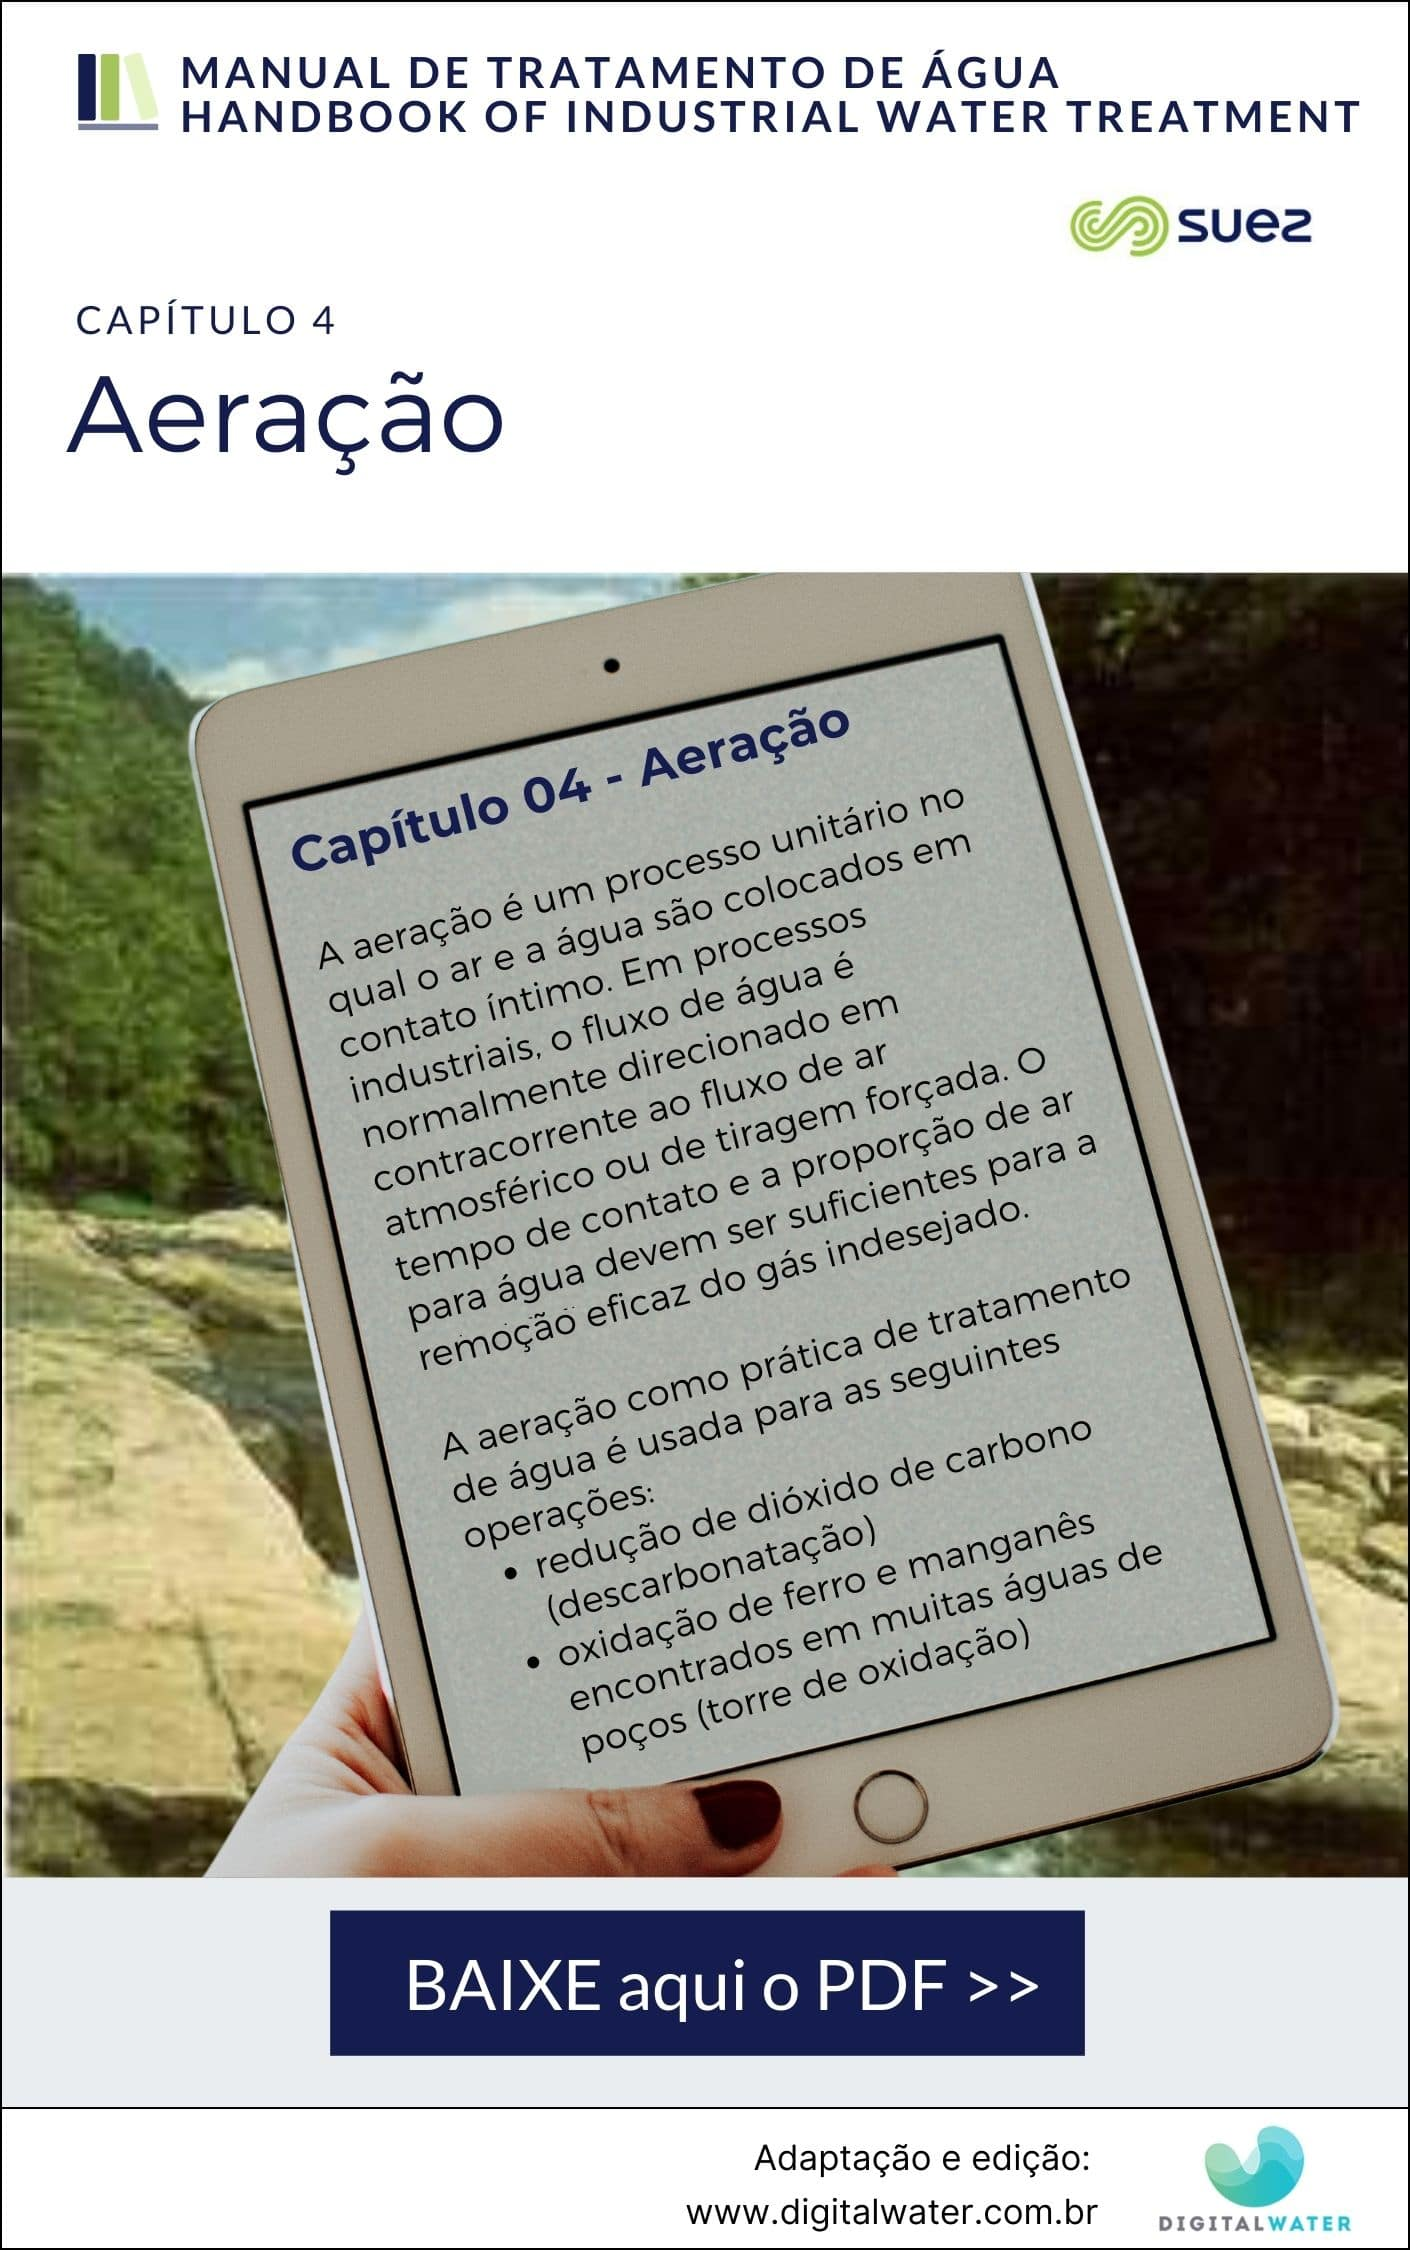 aeracao_handbook_suez_cap4